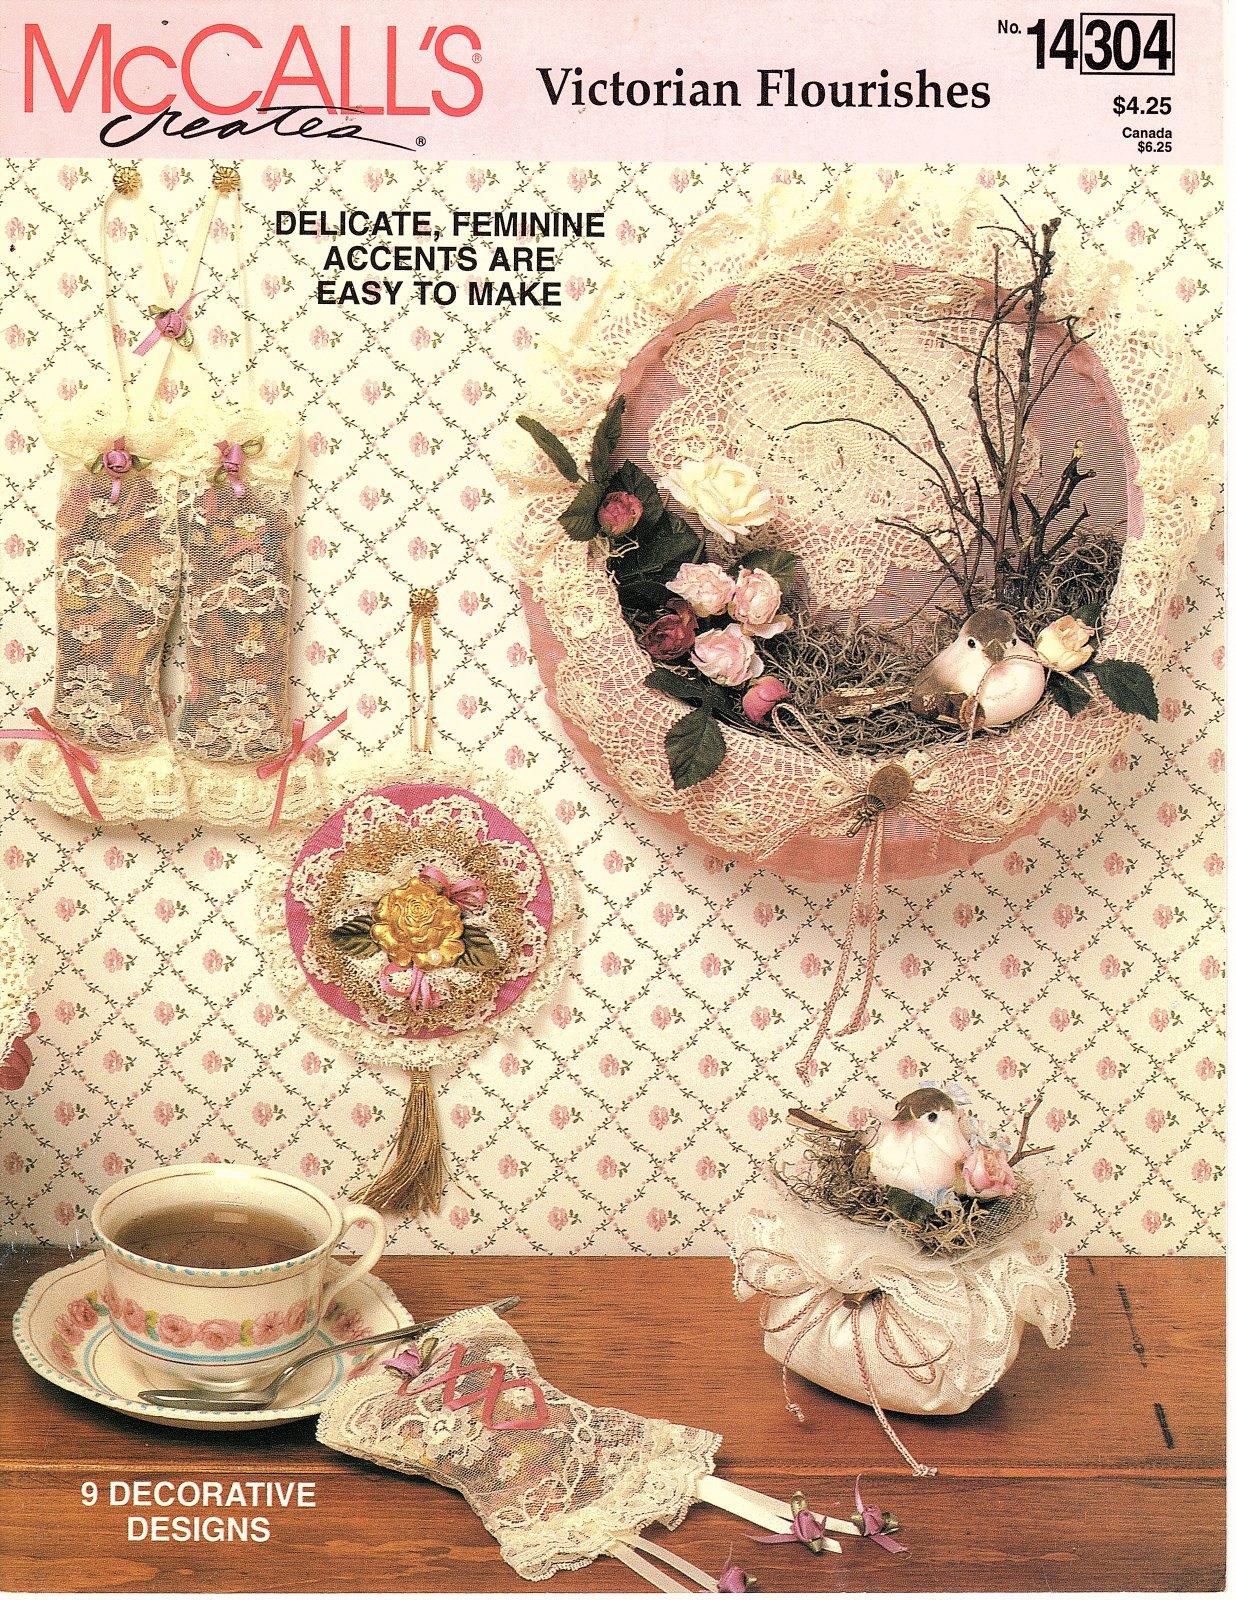 Victorian Flourishes  by McCall's Creates - 9 Designs - Delicate Feminine Accents